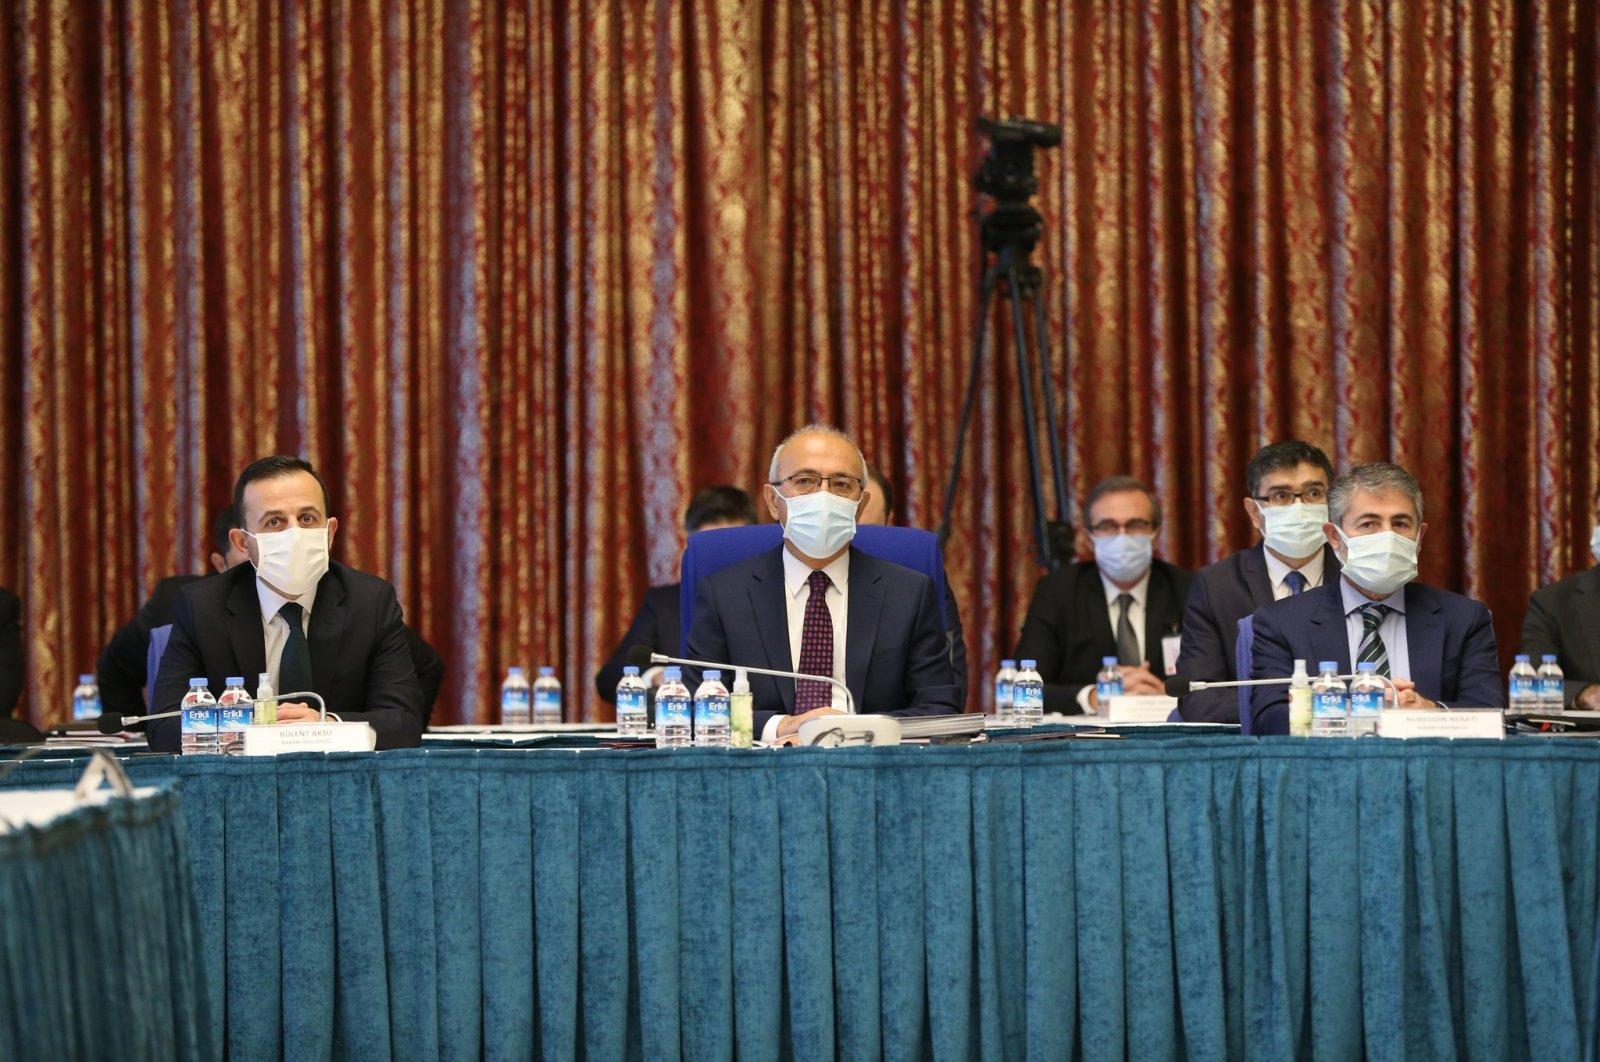 Treasury and Finance Minister Lütfi Elvan (C) speaks at the 2021 budget meeting in the capital Ankara, Turkey, Nov. 17, 2020. (AA Photo)